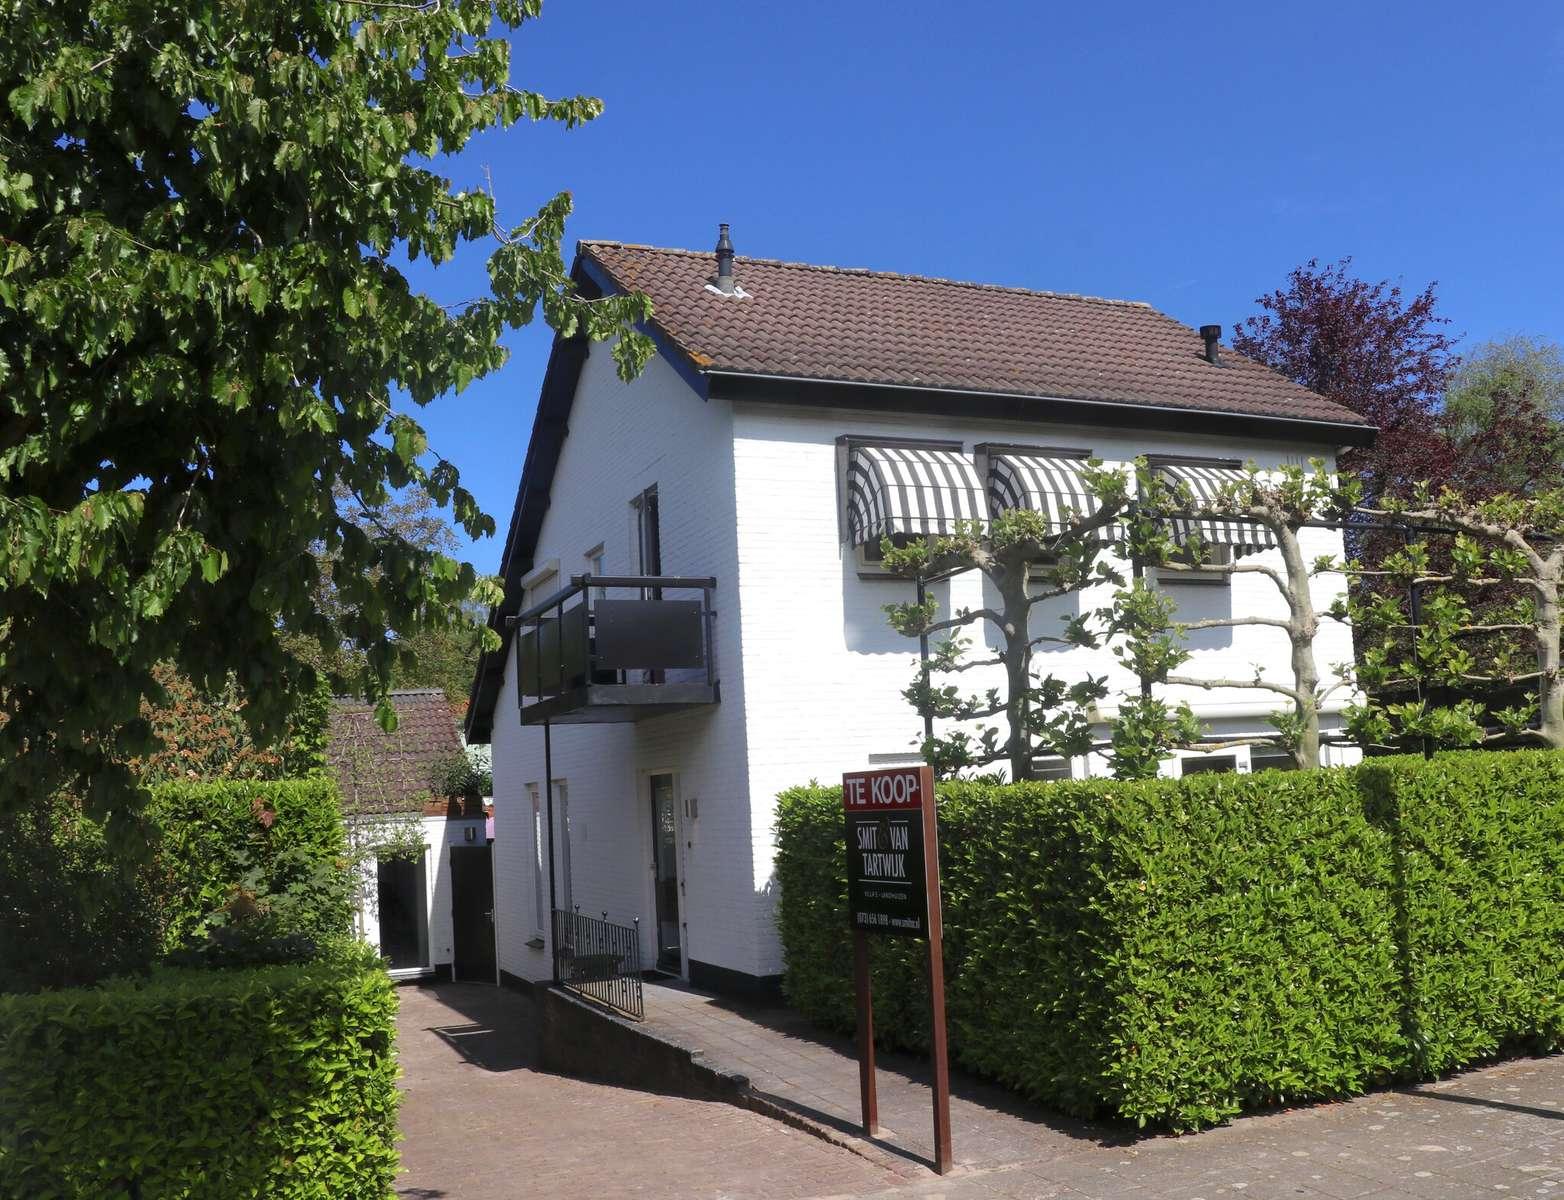 Willem-Alexanderlaan 18, villa Vught